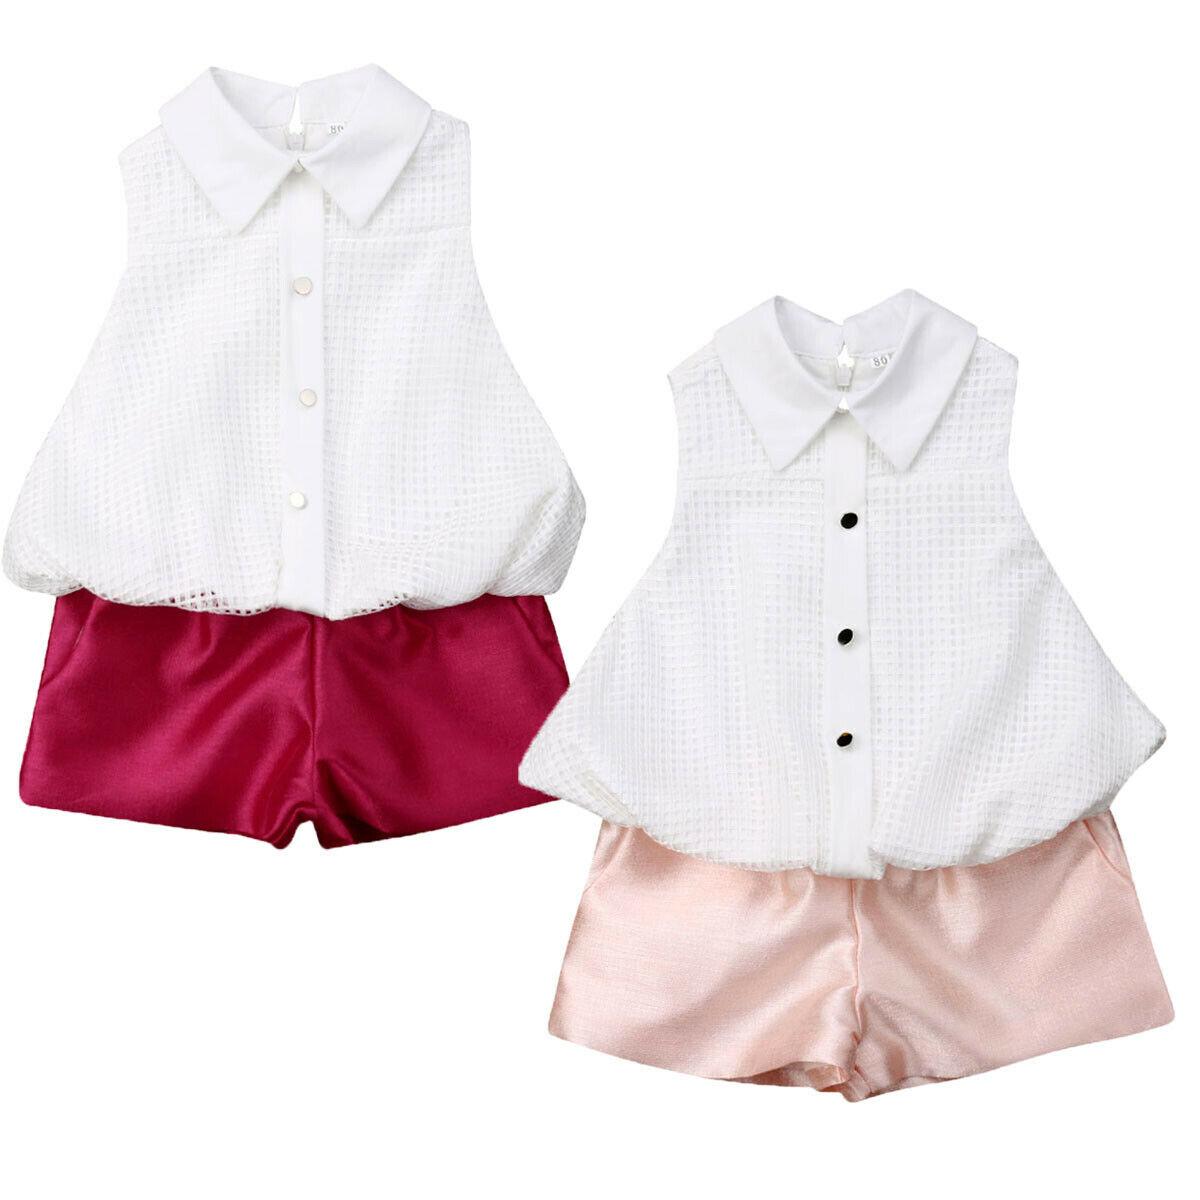 2pcs Toddler Kid Baby Girl Clothes Set Ruffle Shirt Shorts Summer Sleeveless Baby Girl Clothing Outfits Sets Casual